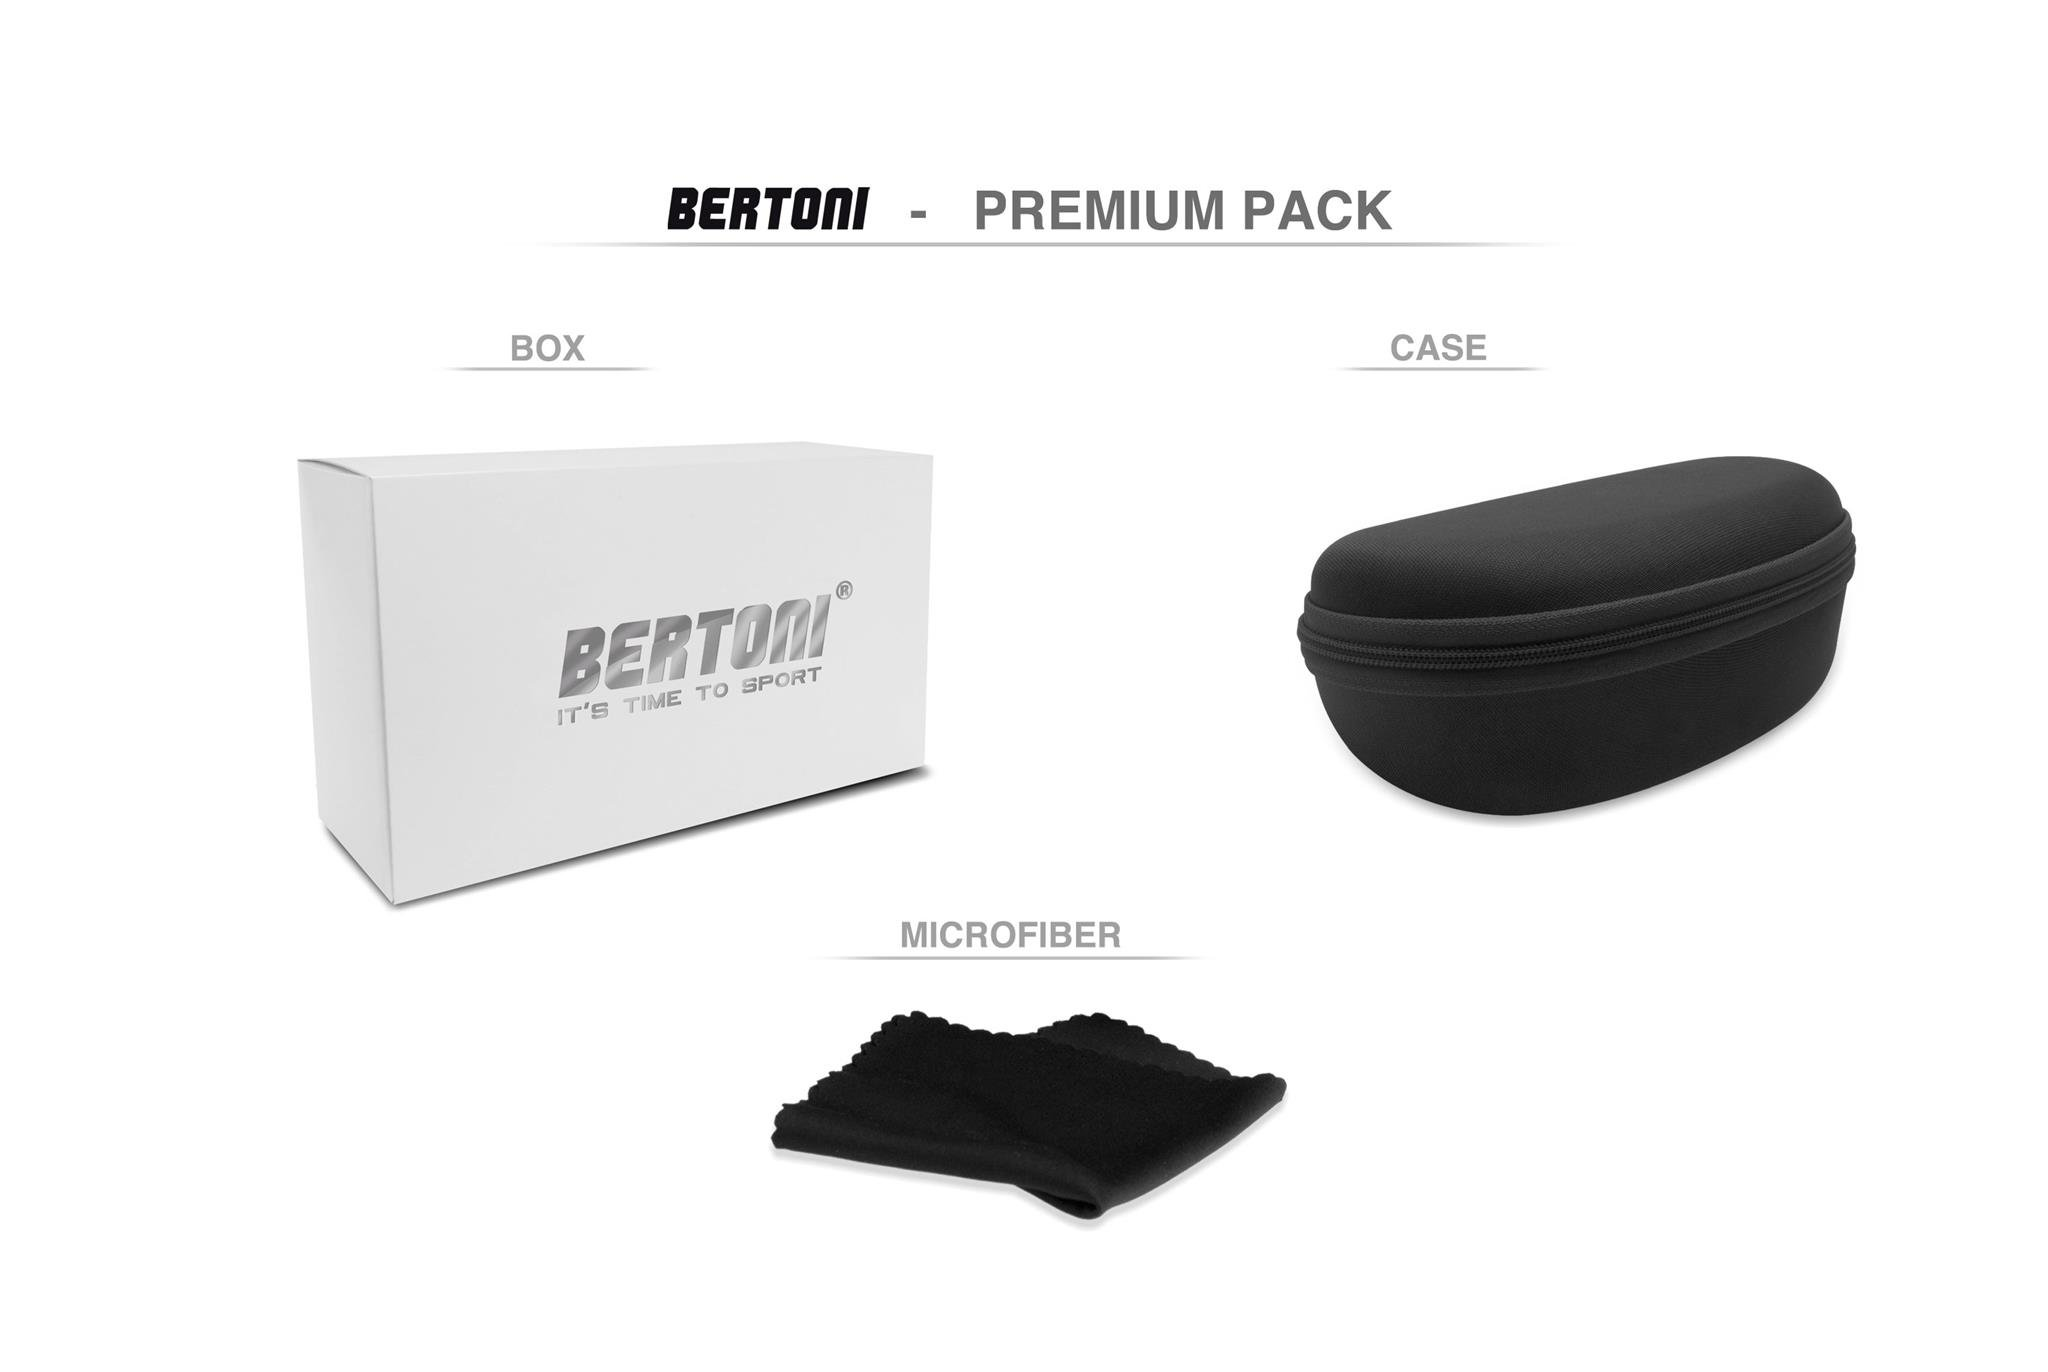 Lunettes de vue moto Bertoni AF399 7